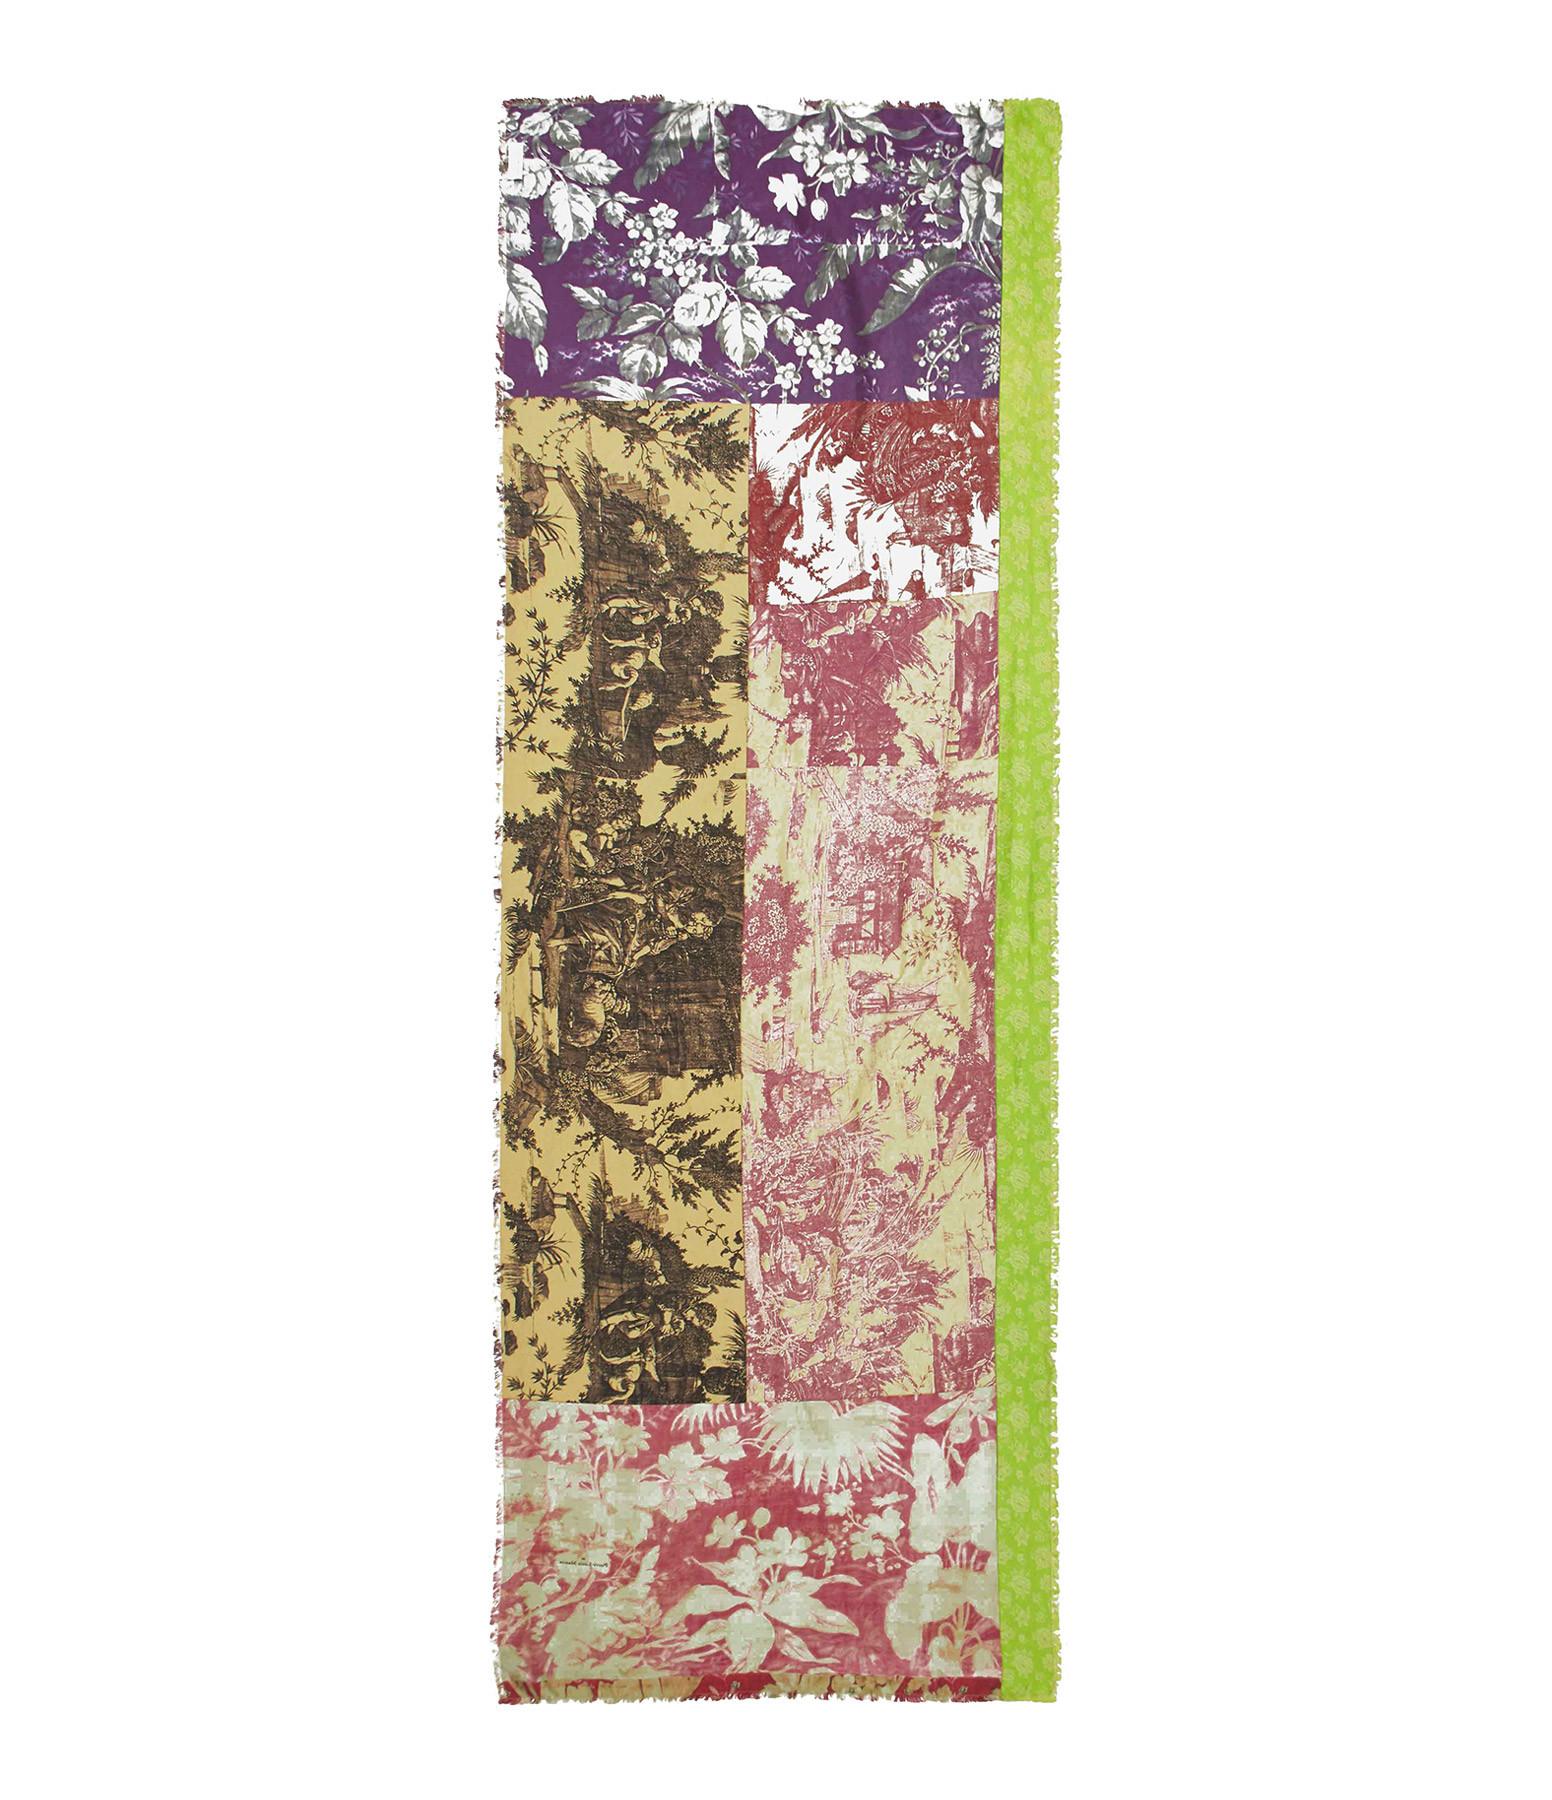 PIERRE-LOUIS MASCIA - Foulard Maggiore Soie Imprimé Multicolore 65 x 190cm